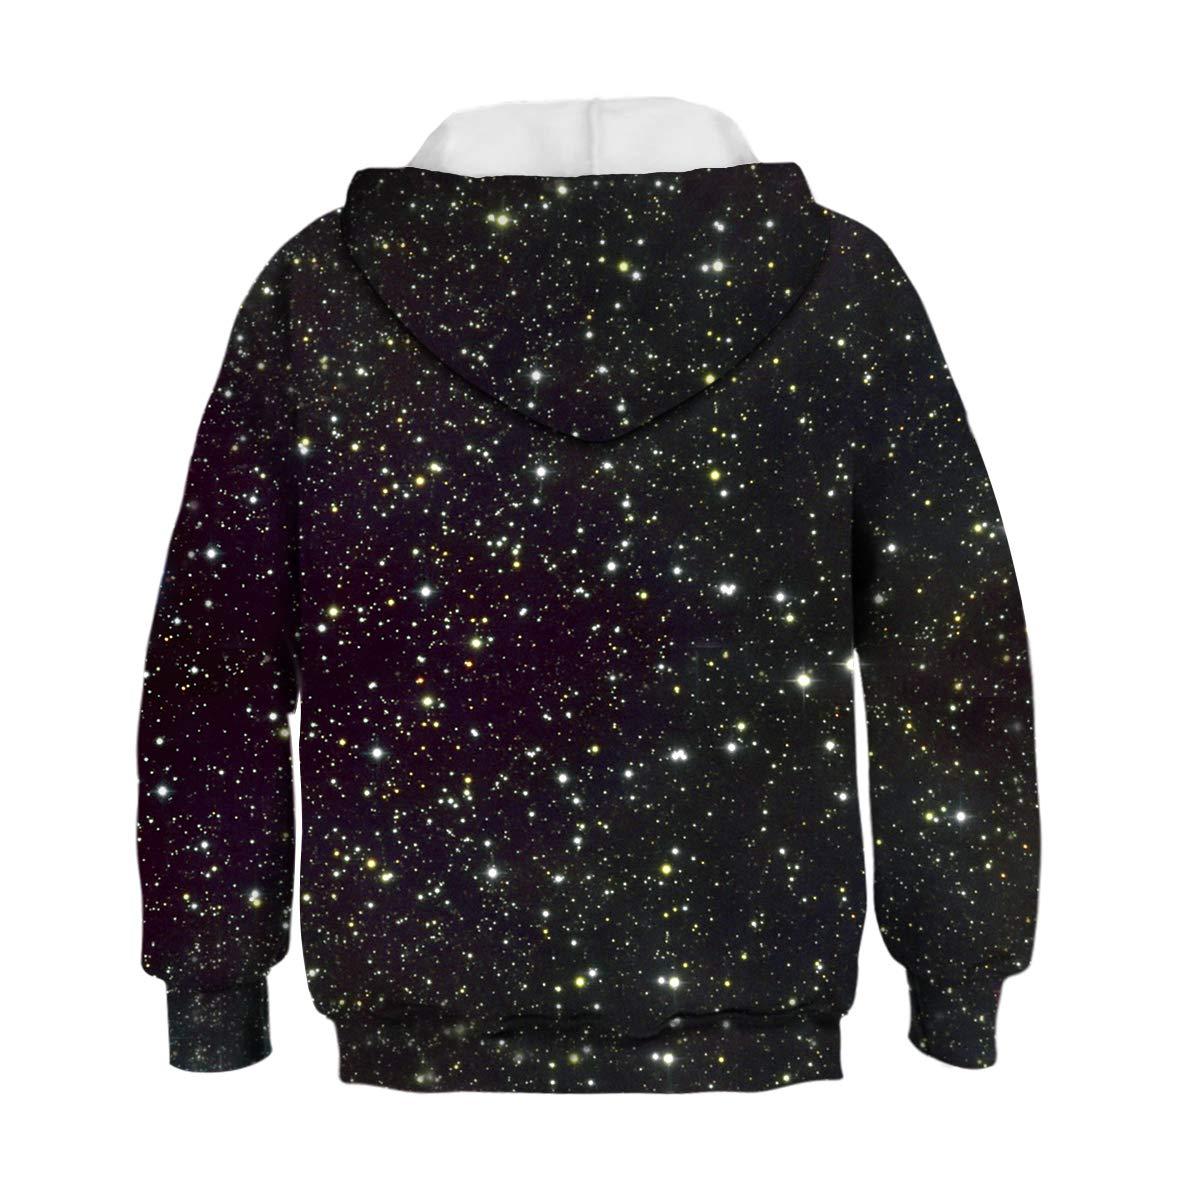 Pattrily Kids Boy Girl 3D Galaxy Animal Print Pullover Hoodies Sweatshirts Fit 6-13 Years